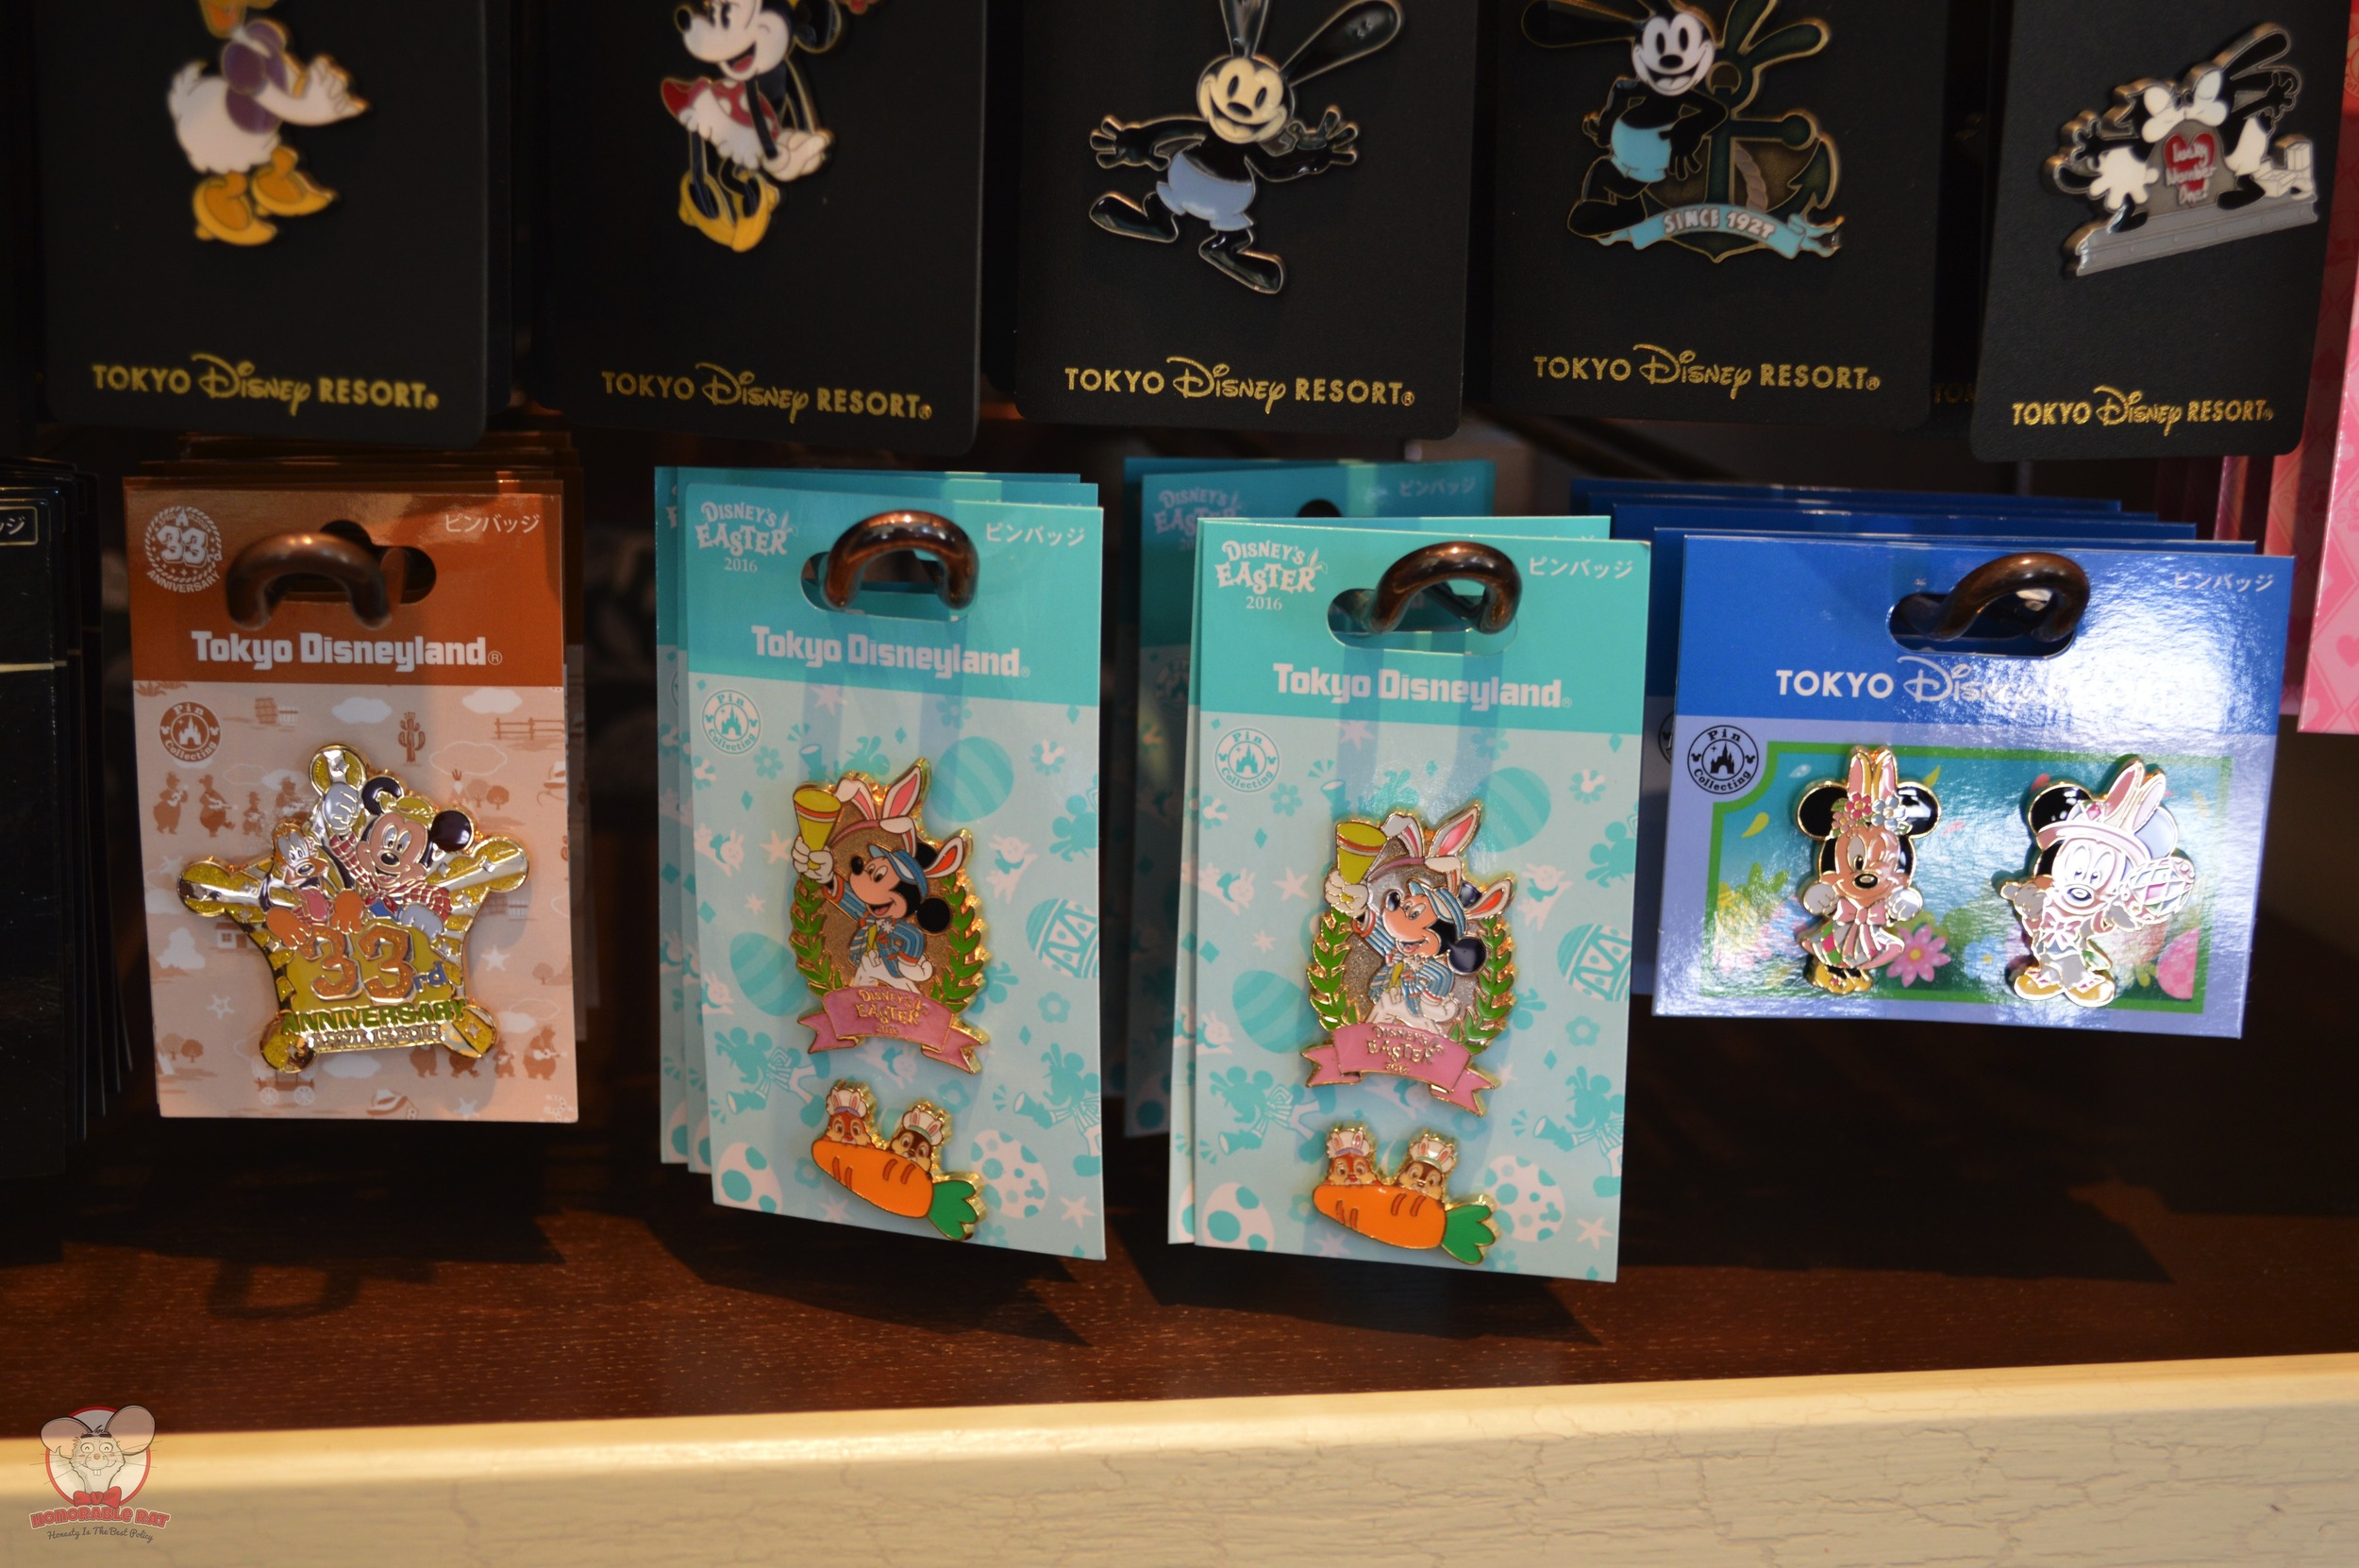 Easter 2016 and Tokyo Disneyland 33rd Anniversary Pin